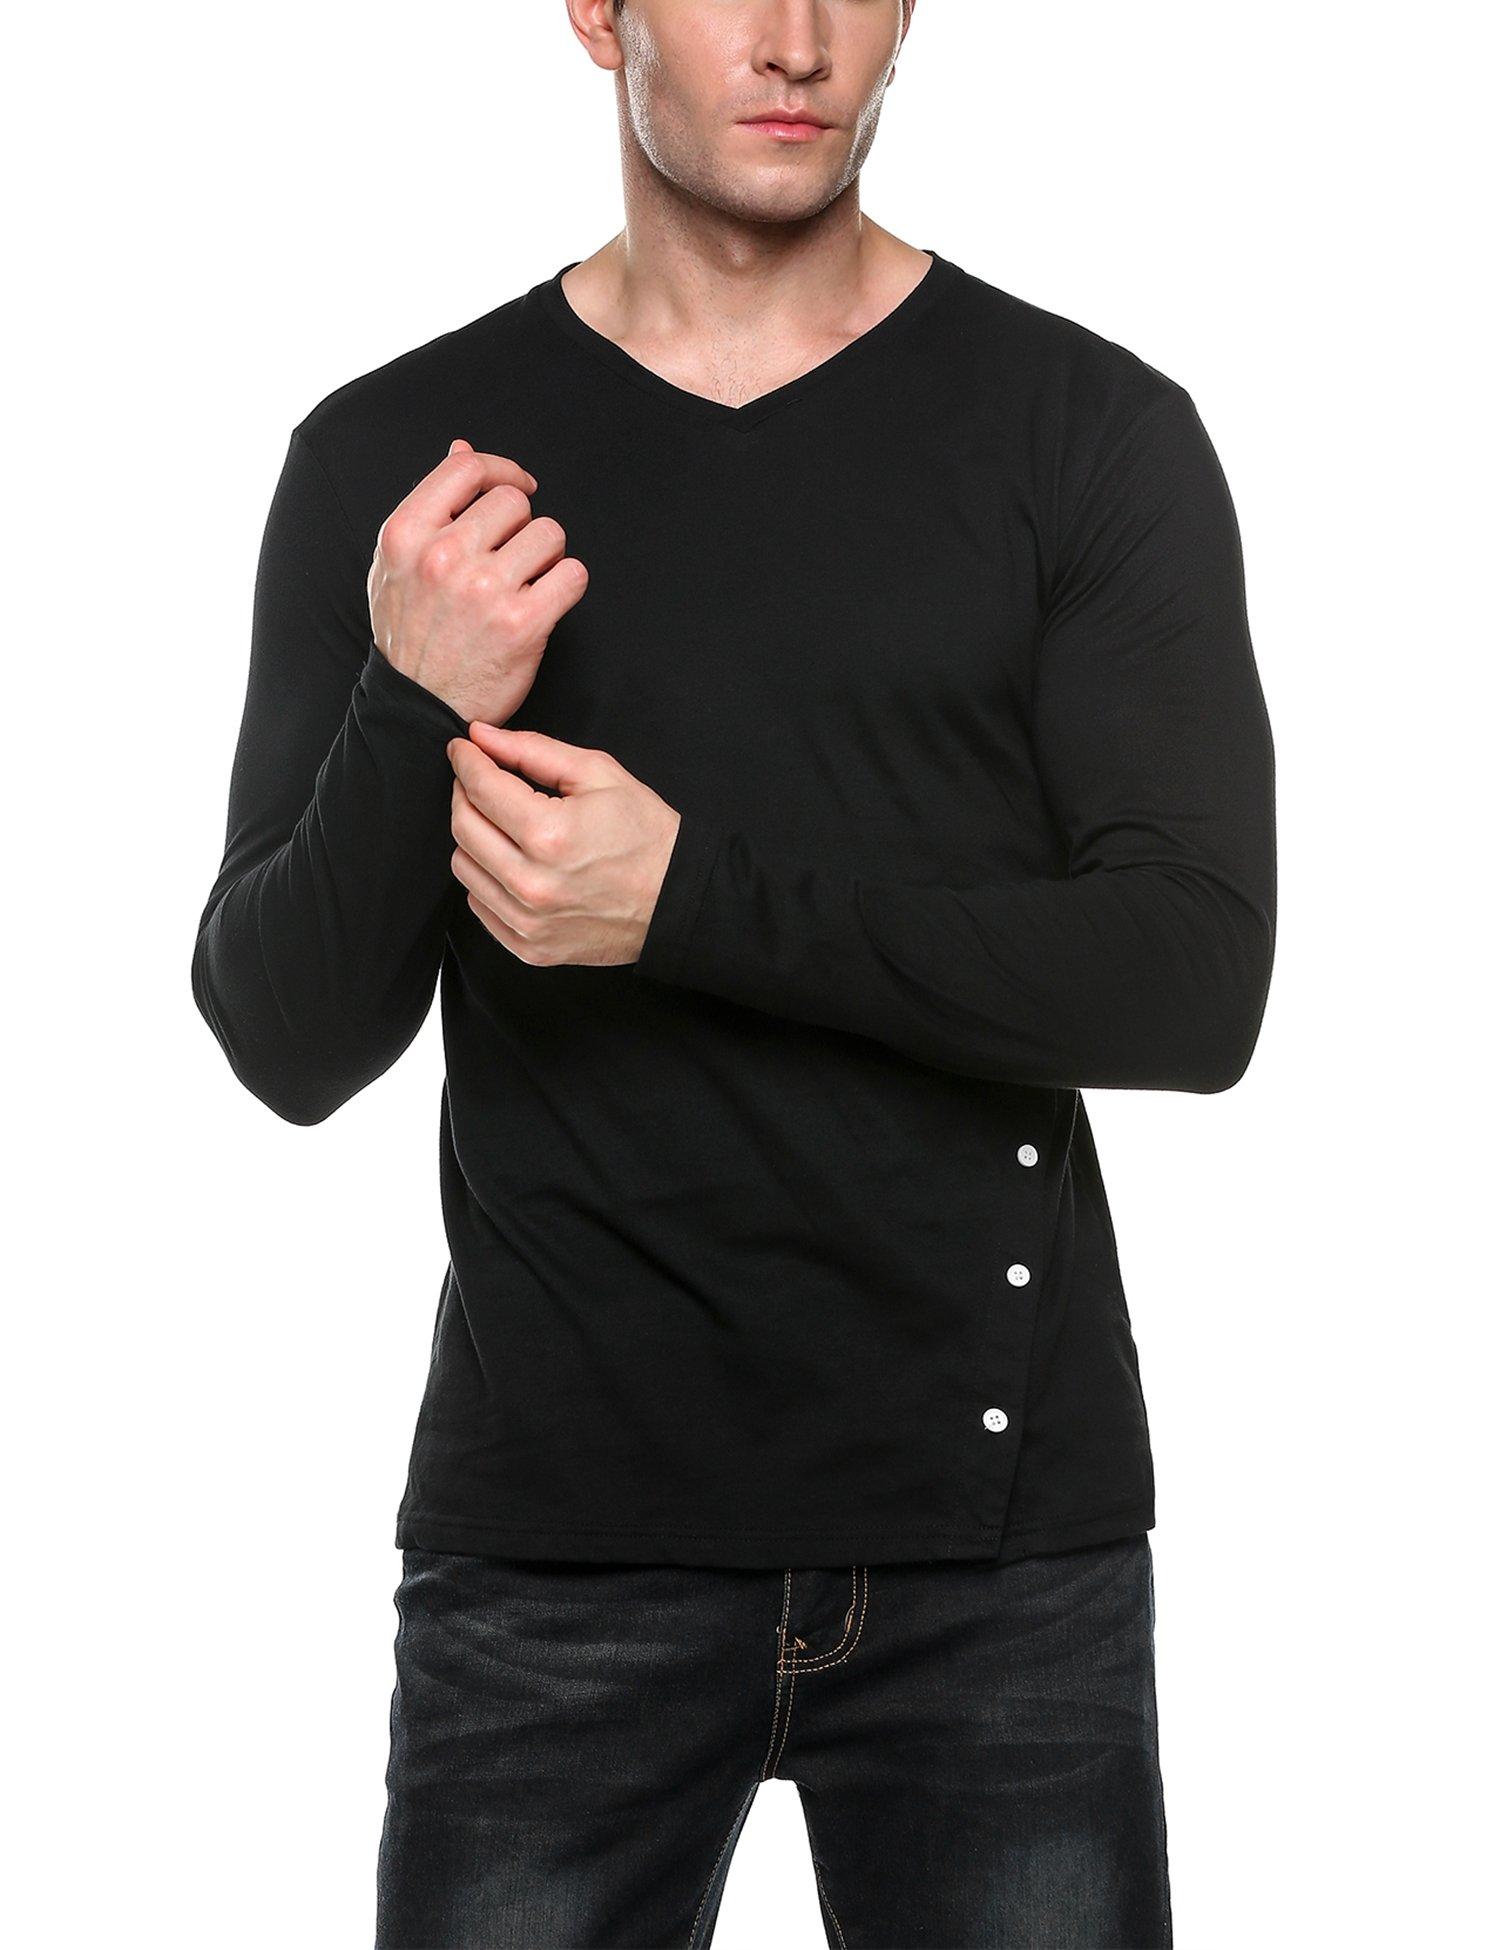 Coofandy Men's Casual Slim Fit Side Button Long Sleeve V-Neck T-Shirts, Black, Medium